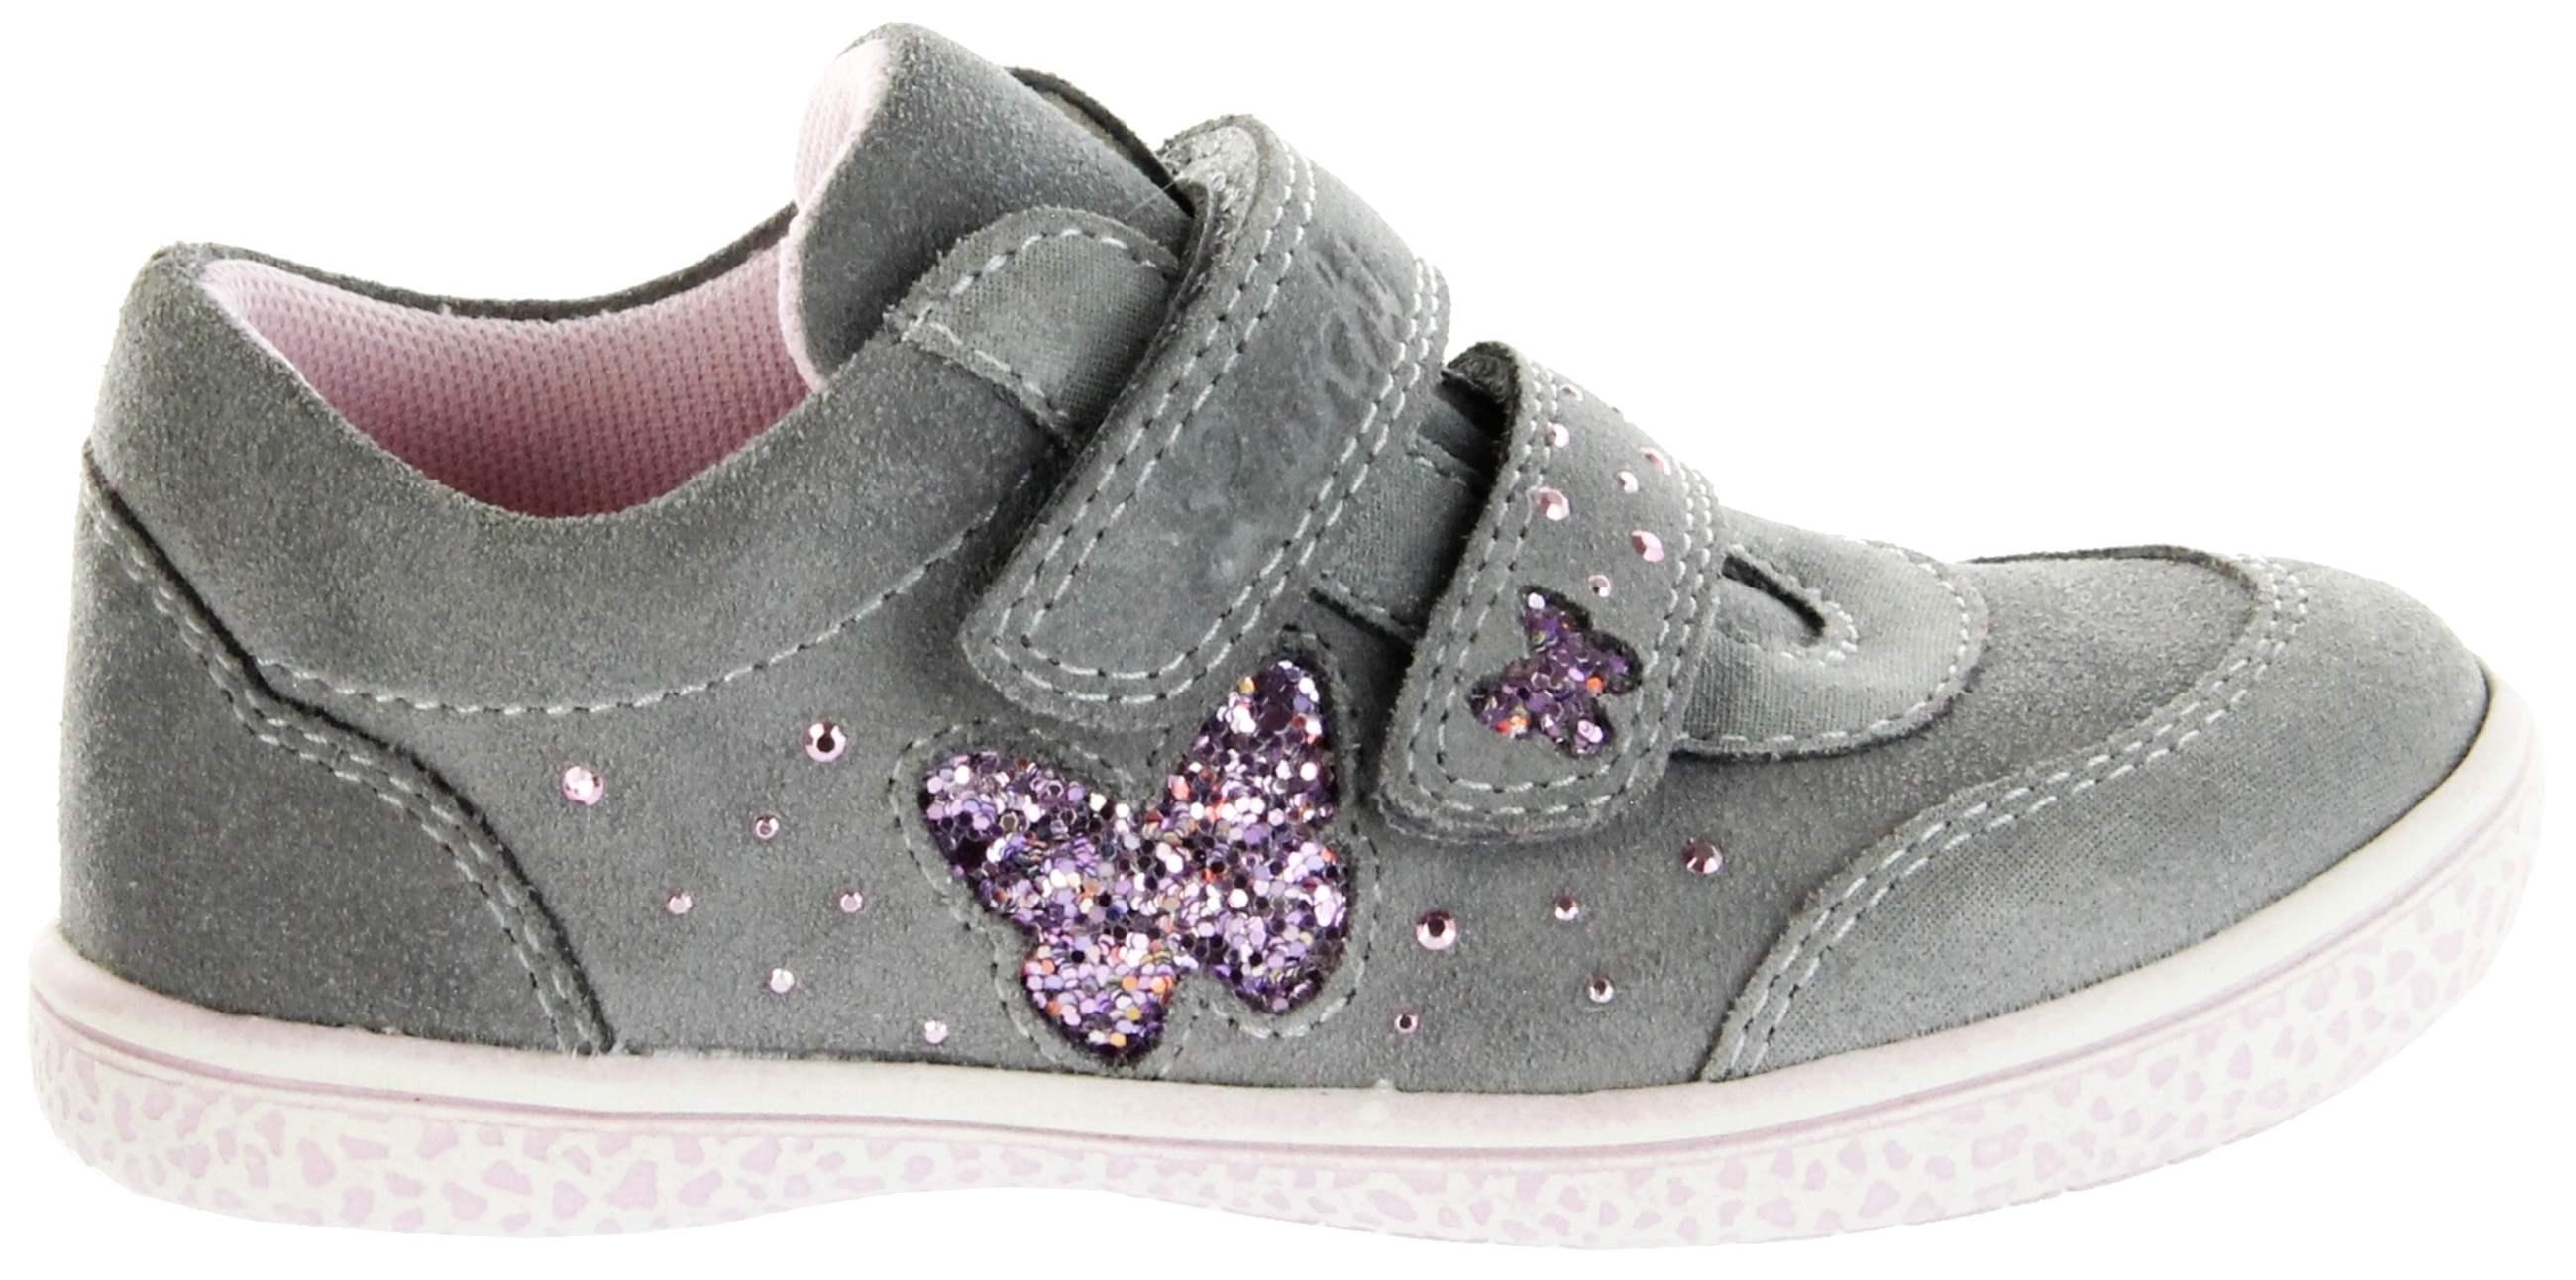 online store e1dbd 2b76c Lurchi Kinder Halbschuhe Sneaker grau Velourleder Mädchen Schuhe  33-15279-25 lt. grey Tany